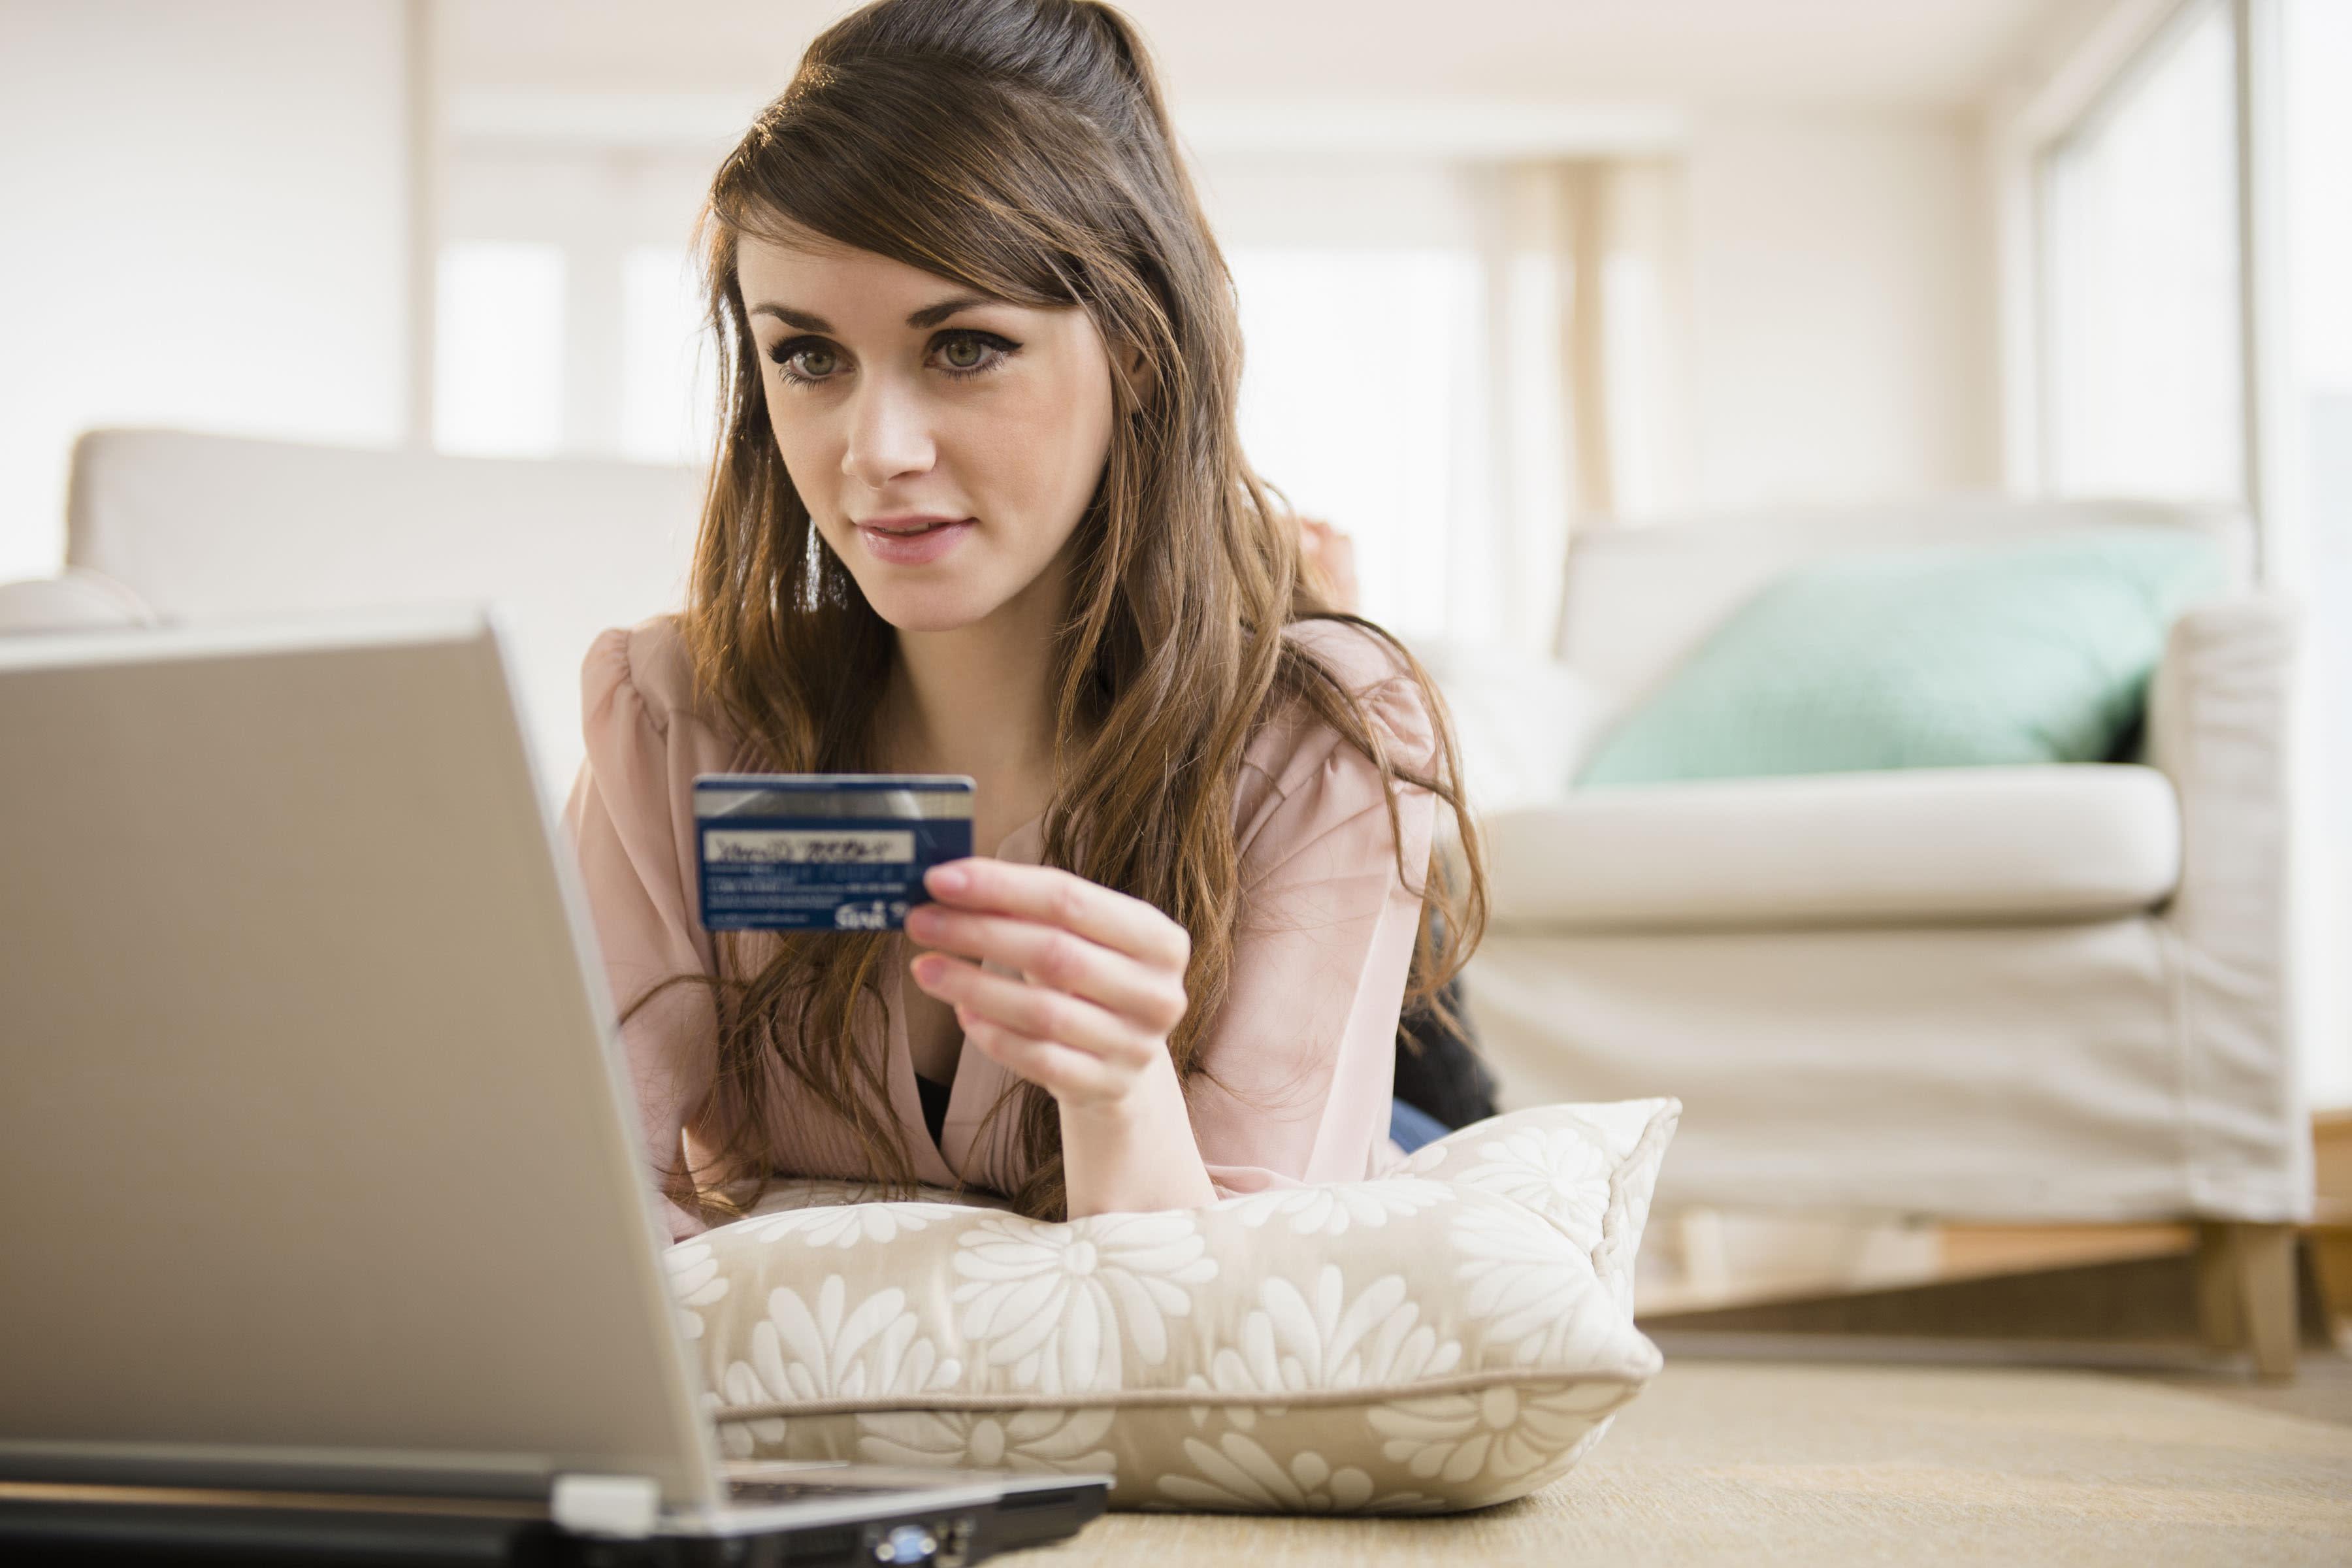 freche abzocke vorsicht vor dieser kreditkarte. Black Bedroom Furniture Sets. Home Design Ideas